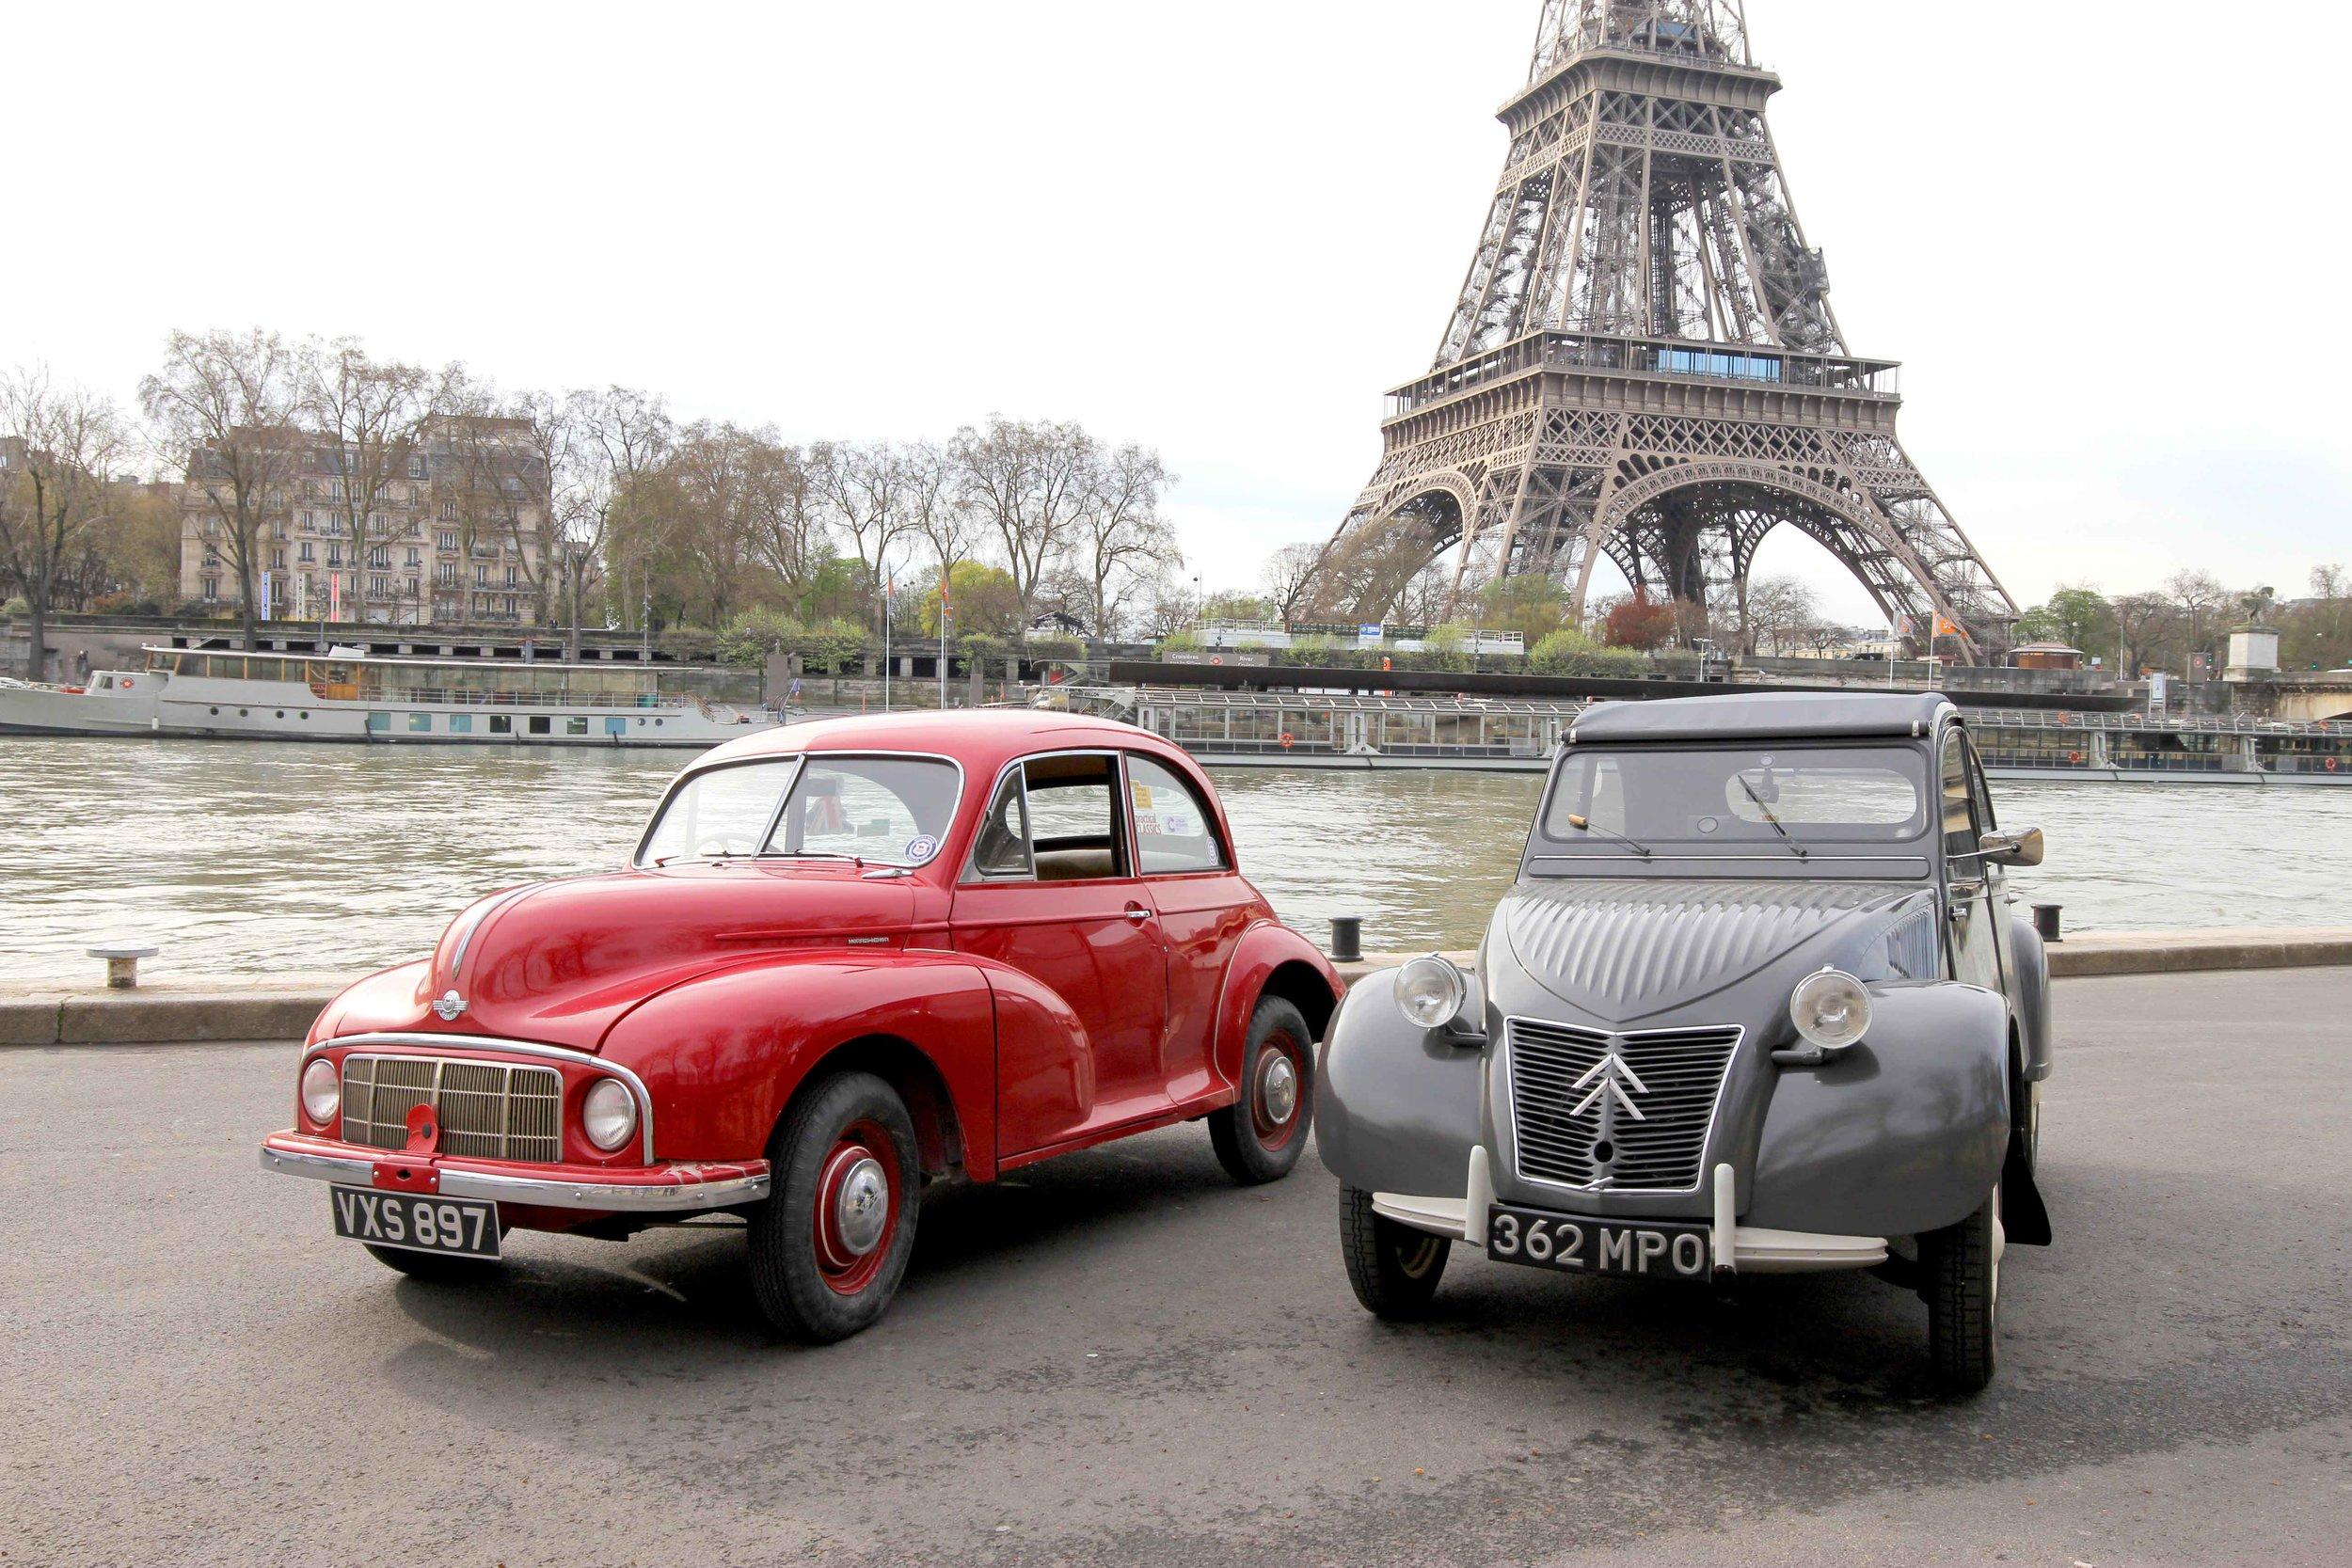 02 PARIS1.JPG